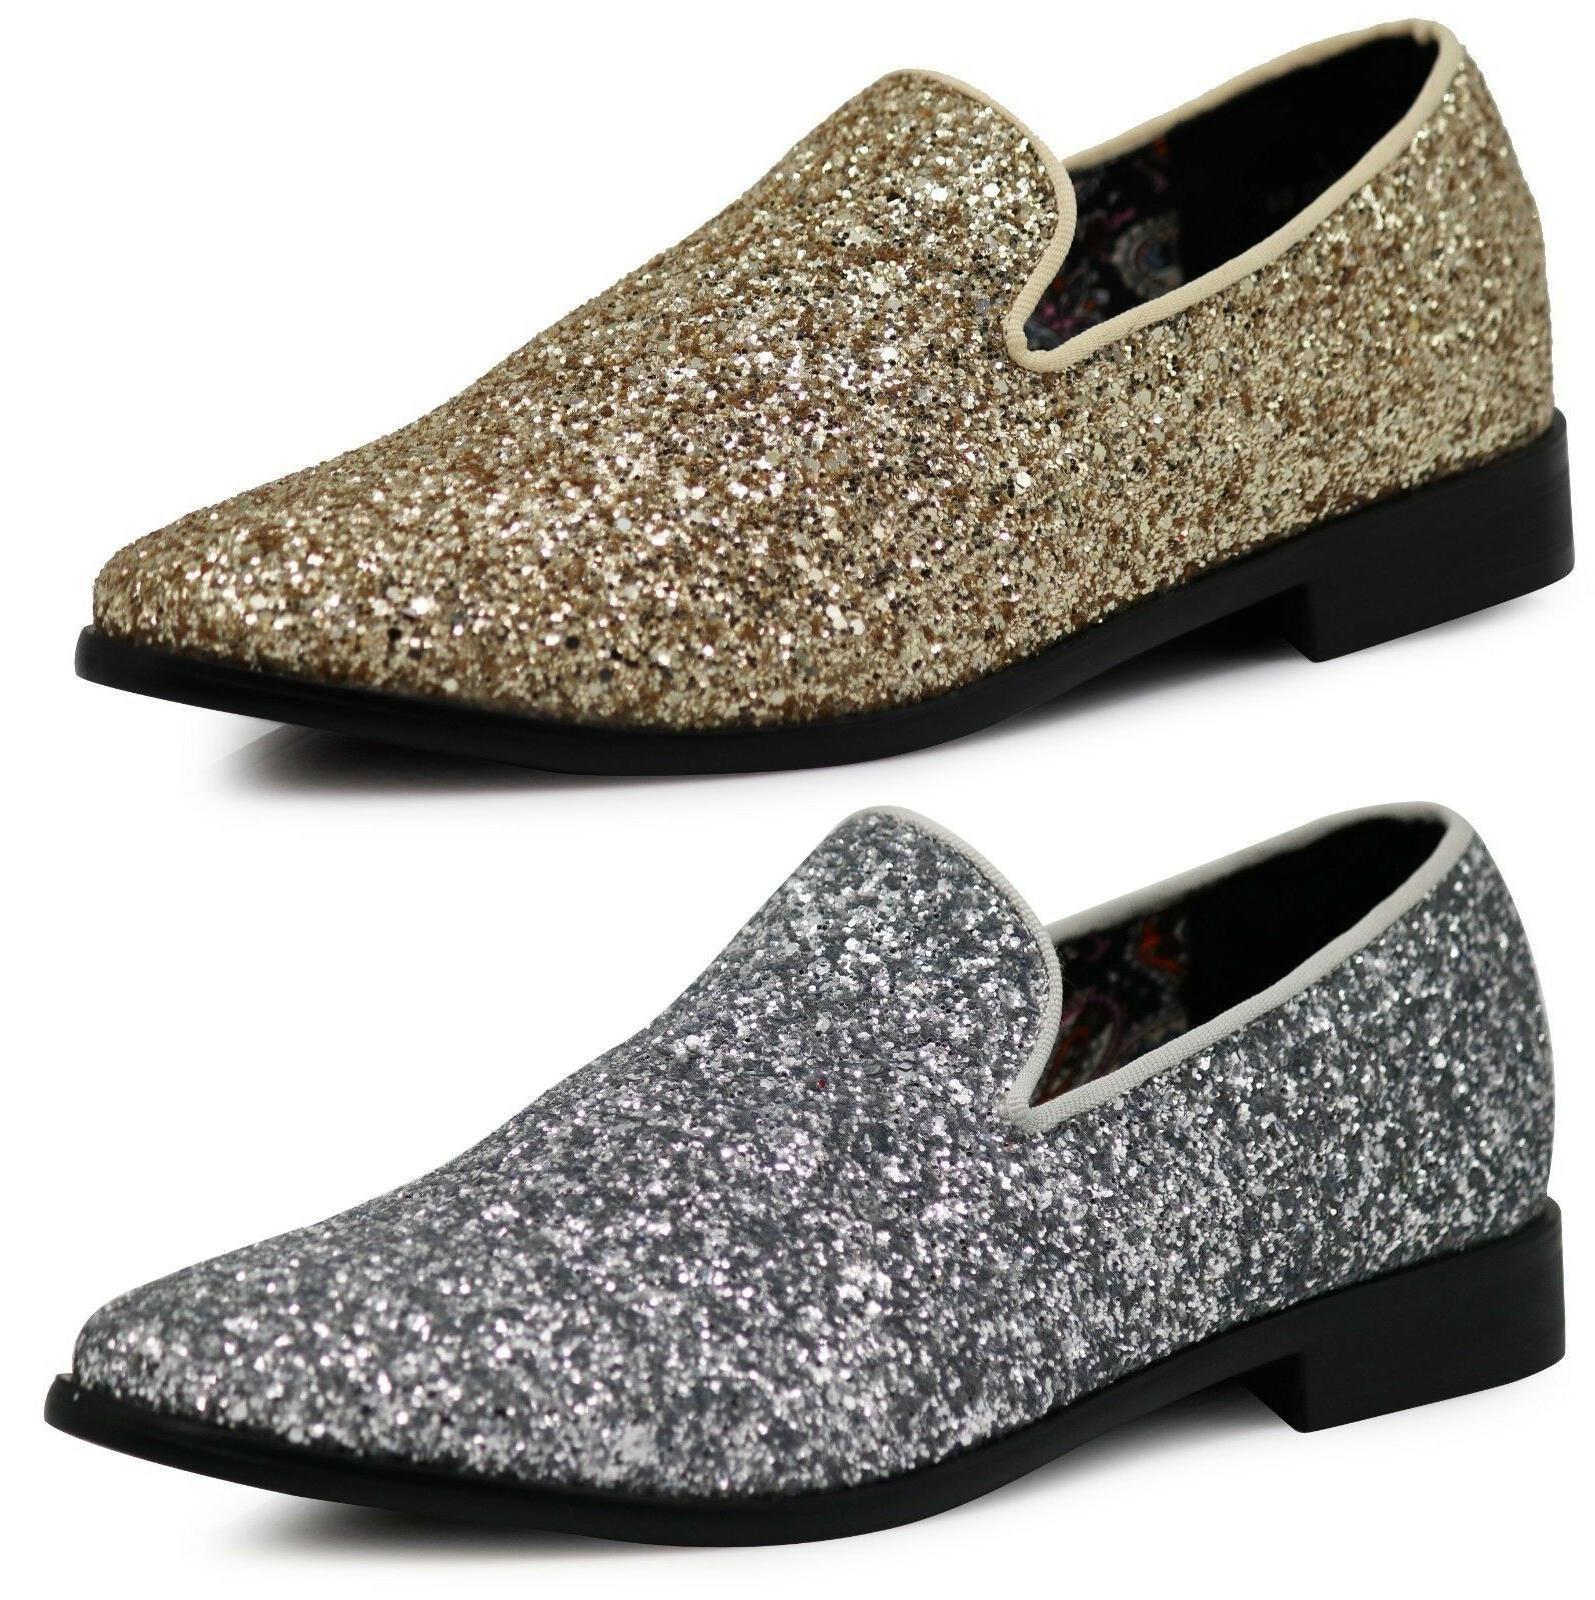 new men vintage glitter stage dress shoes